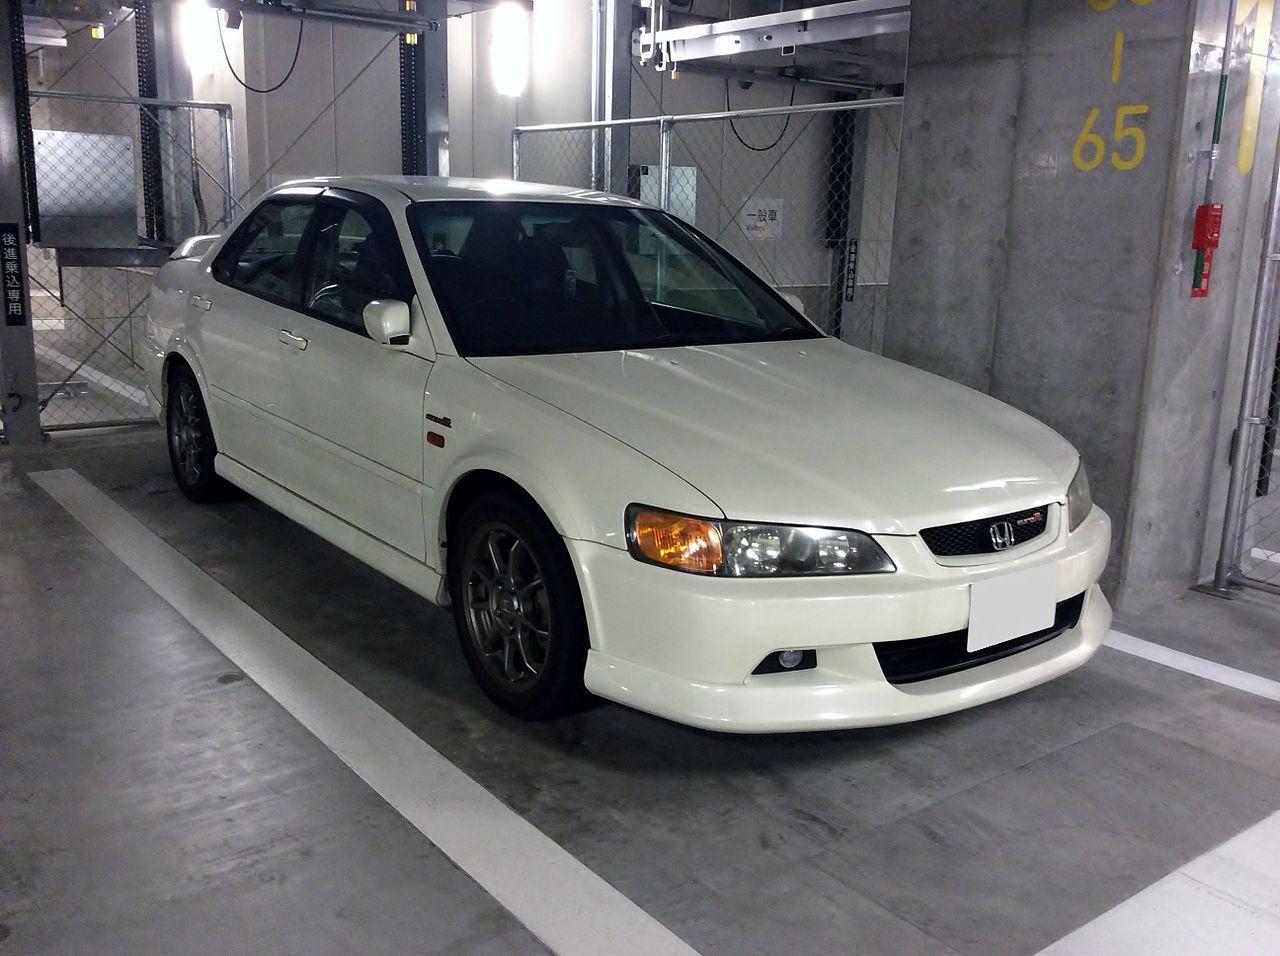 file honda accord euro r cl1 front jpg wikimedia commons rh commons wikimedia org Honda Accord Euro R CL1 CL1 Honda Type R